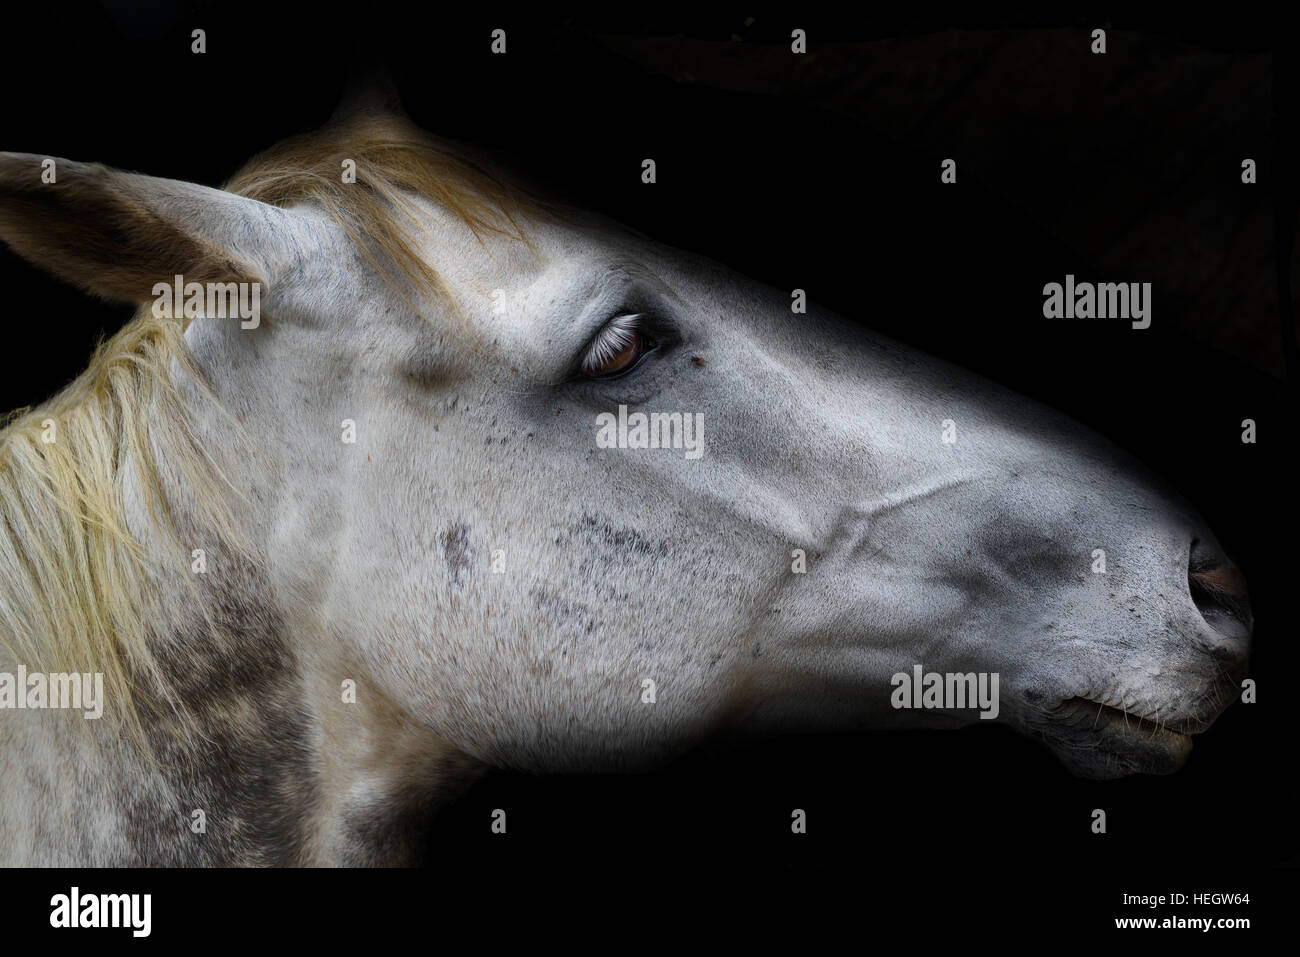 White horse head isolated on black stock image